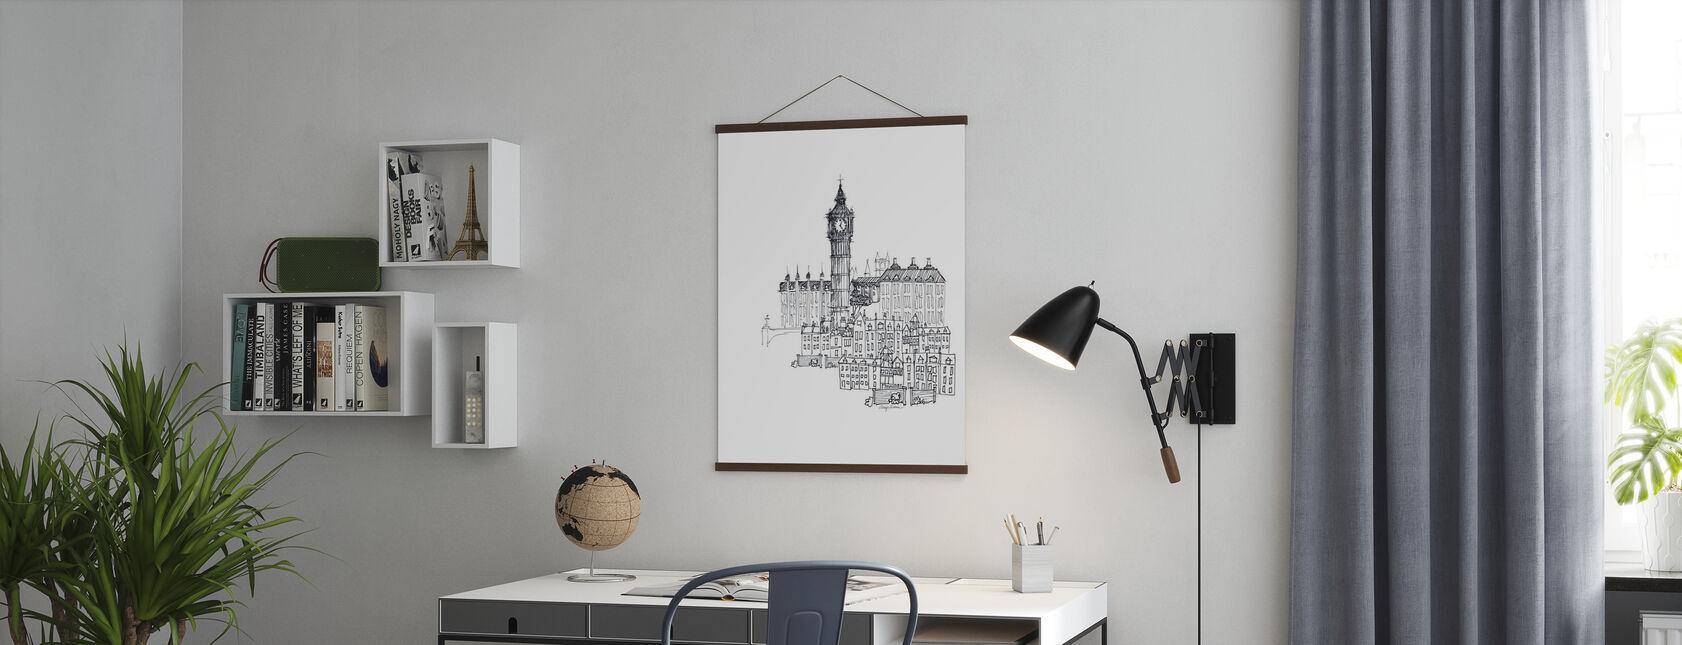 Avery Tillmon - Big Ben - Poster - Uffici